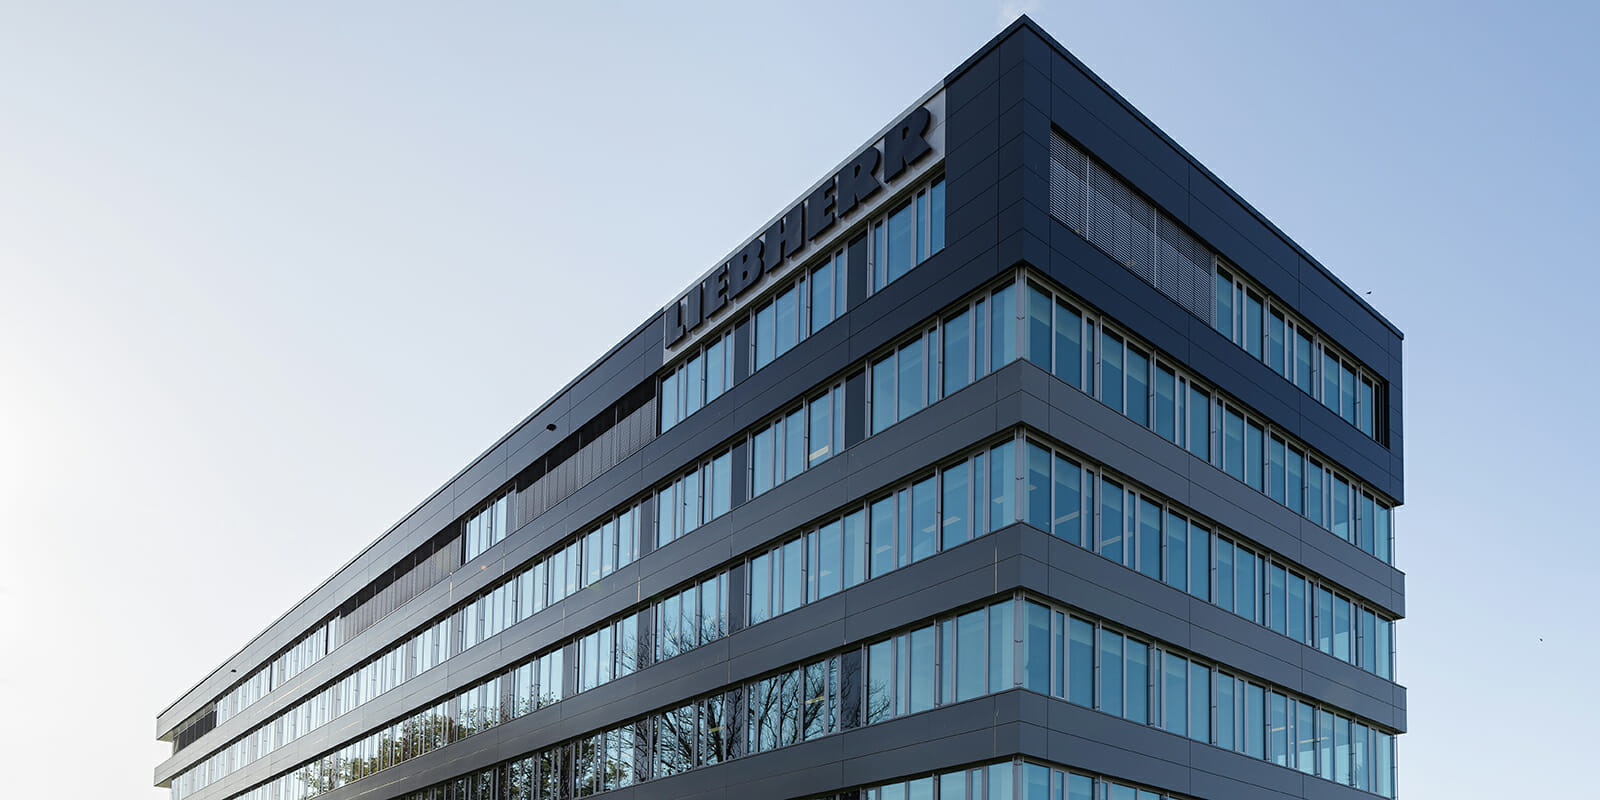 Liebherr-Werk Biberach GmbH, 88400 Biberach an der Riss